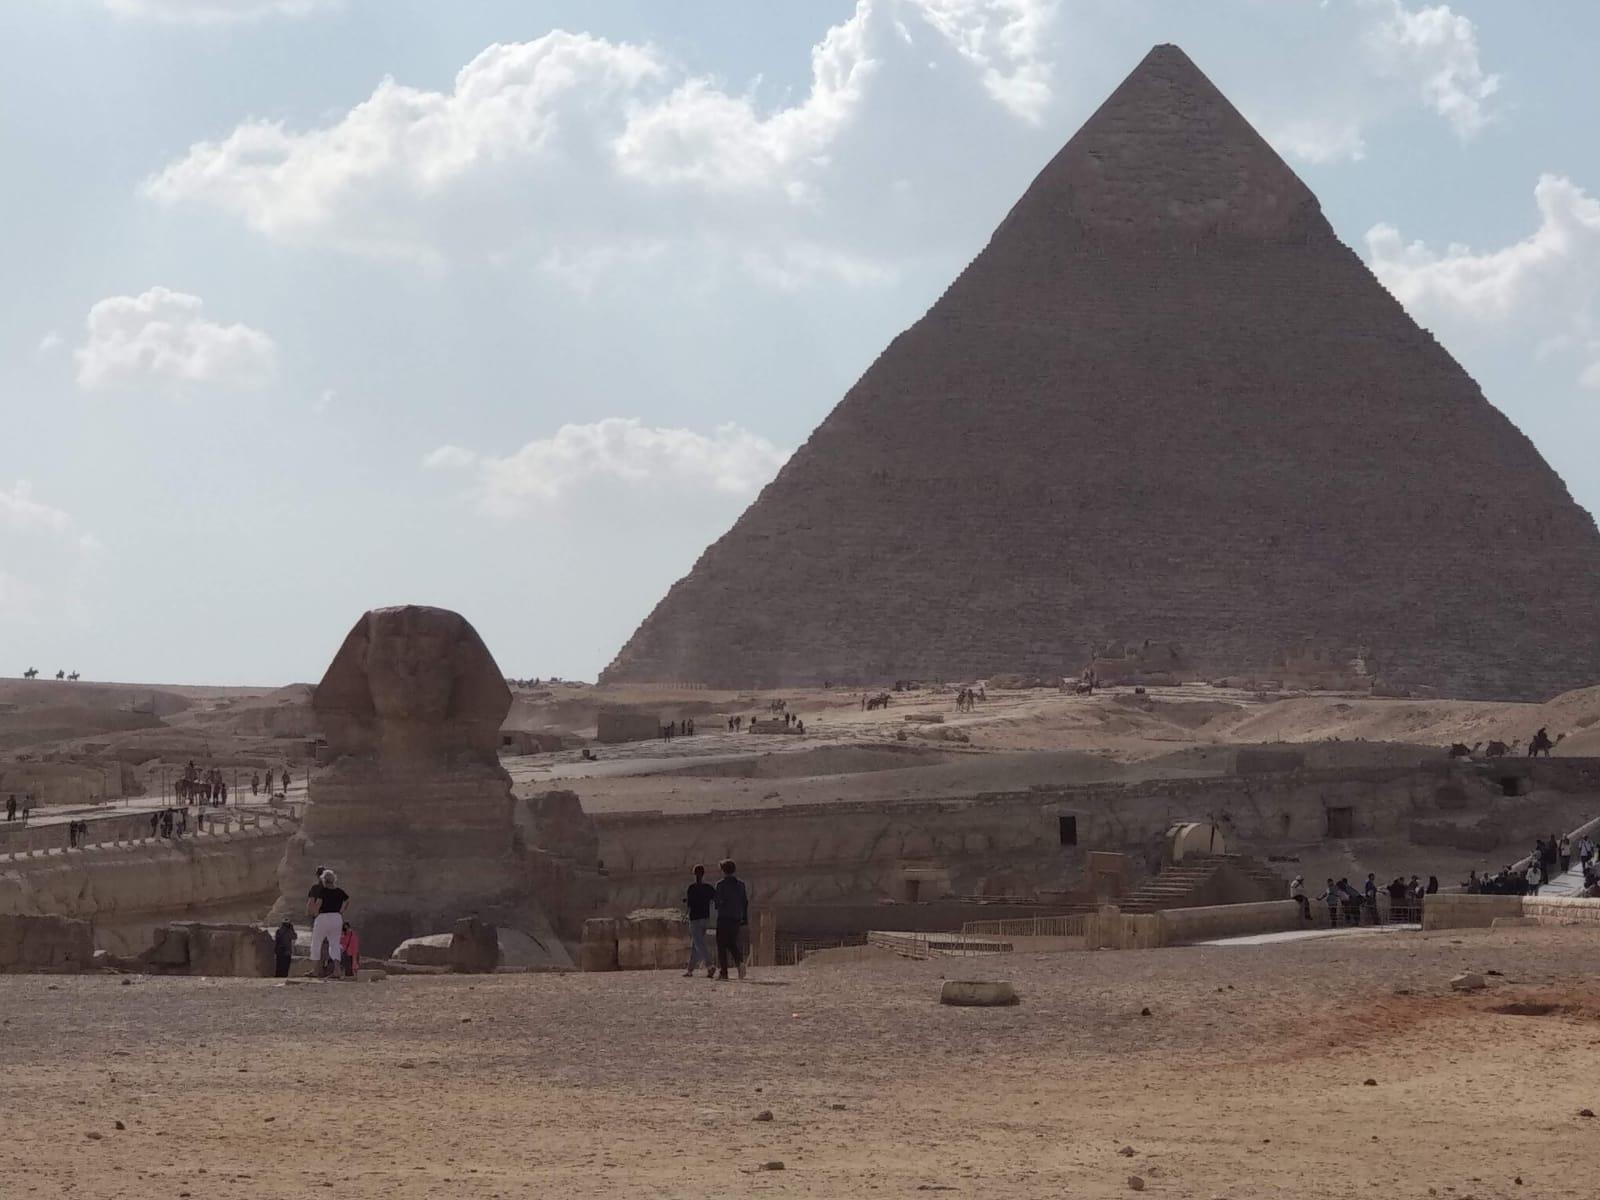 2-Tagesausflug Kairo mit Übernachtung und Flug ab Makadi Bay/Sahl Hasheesh